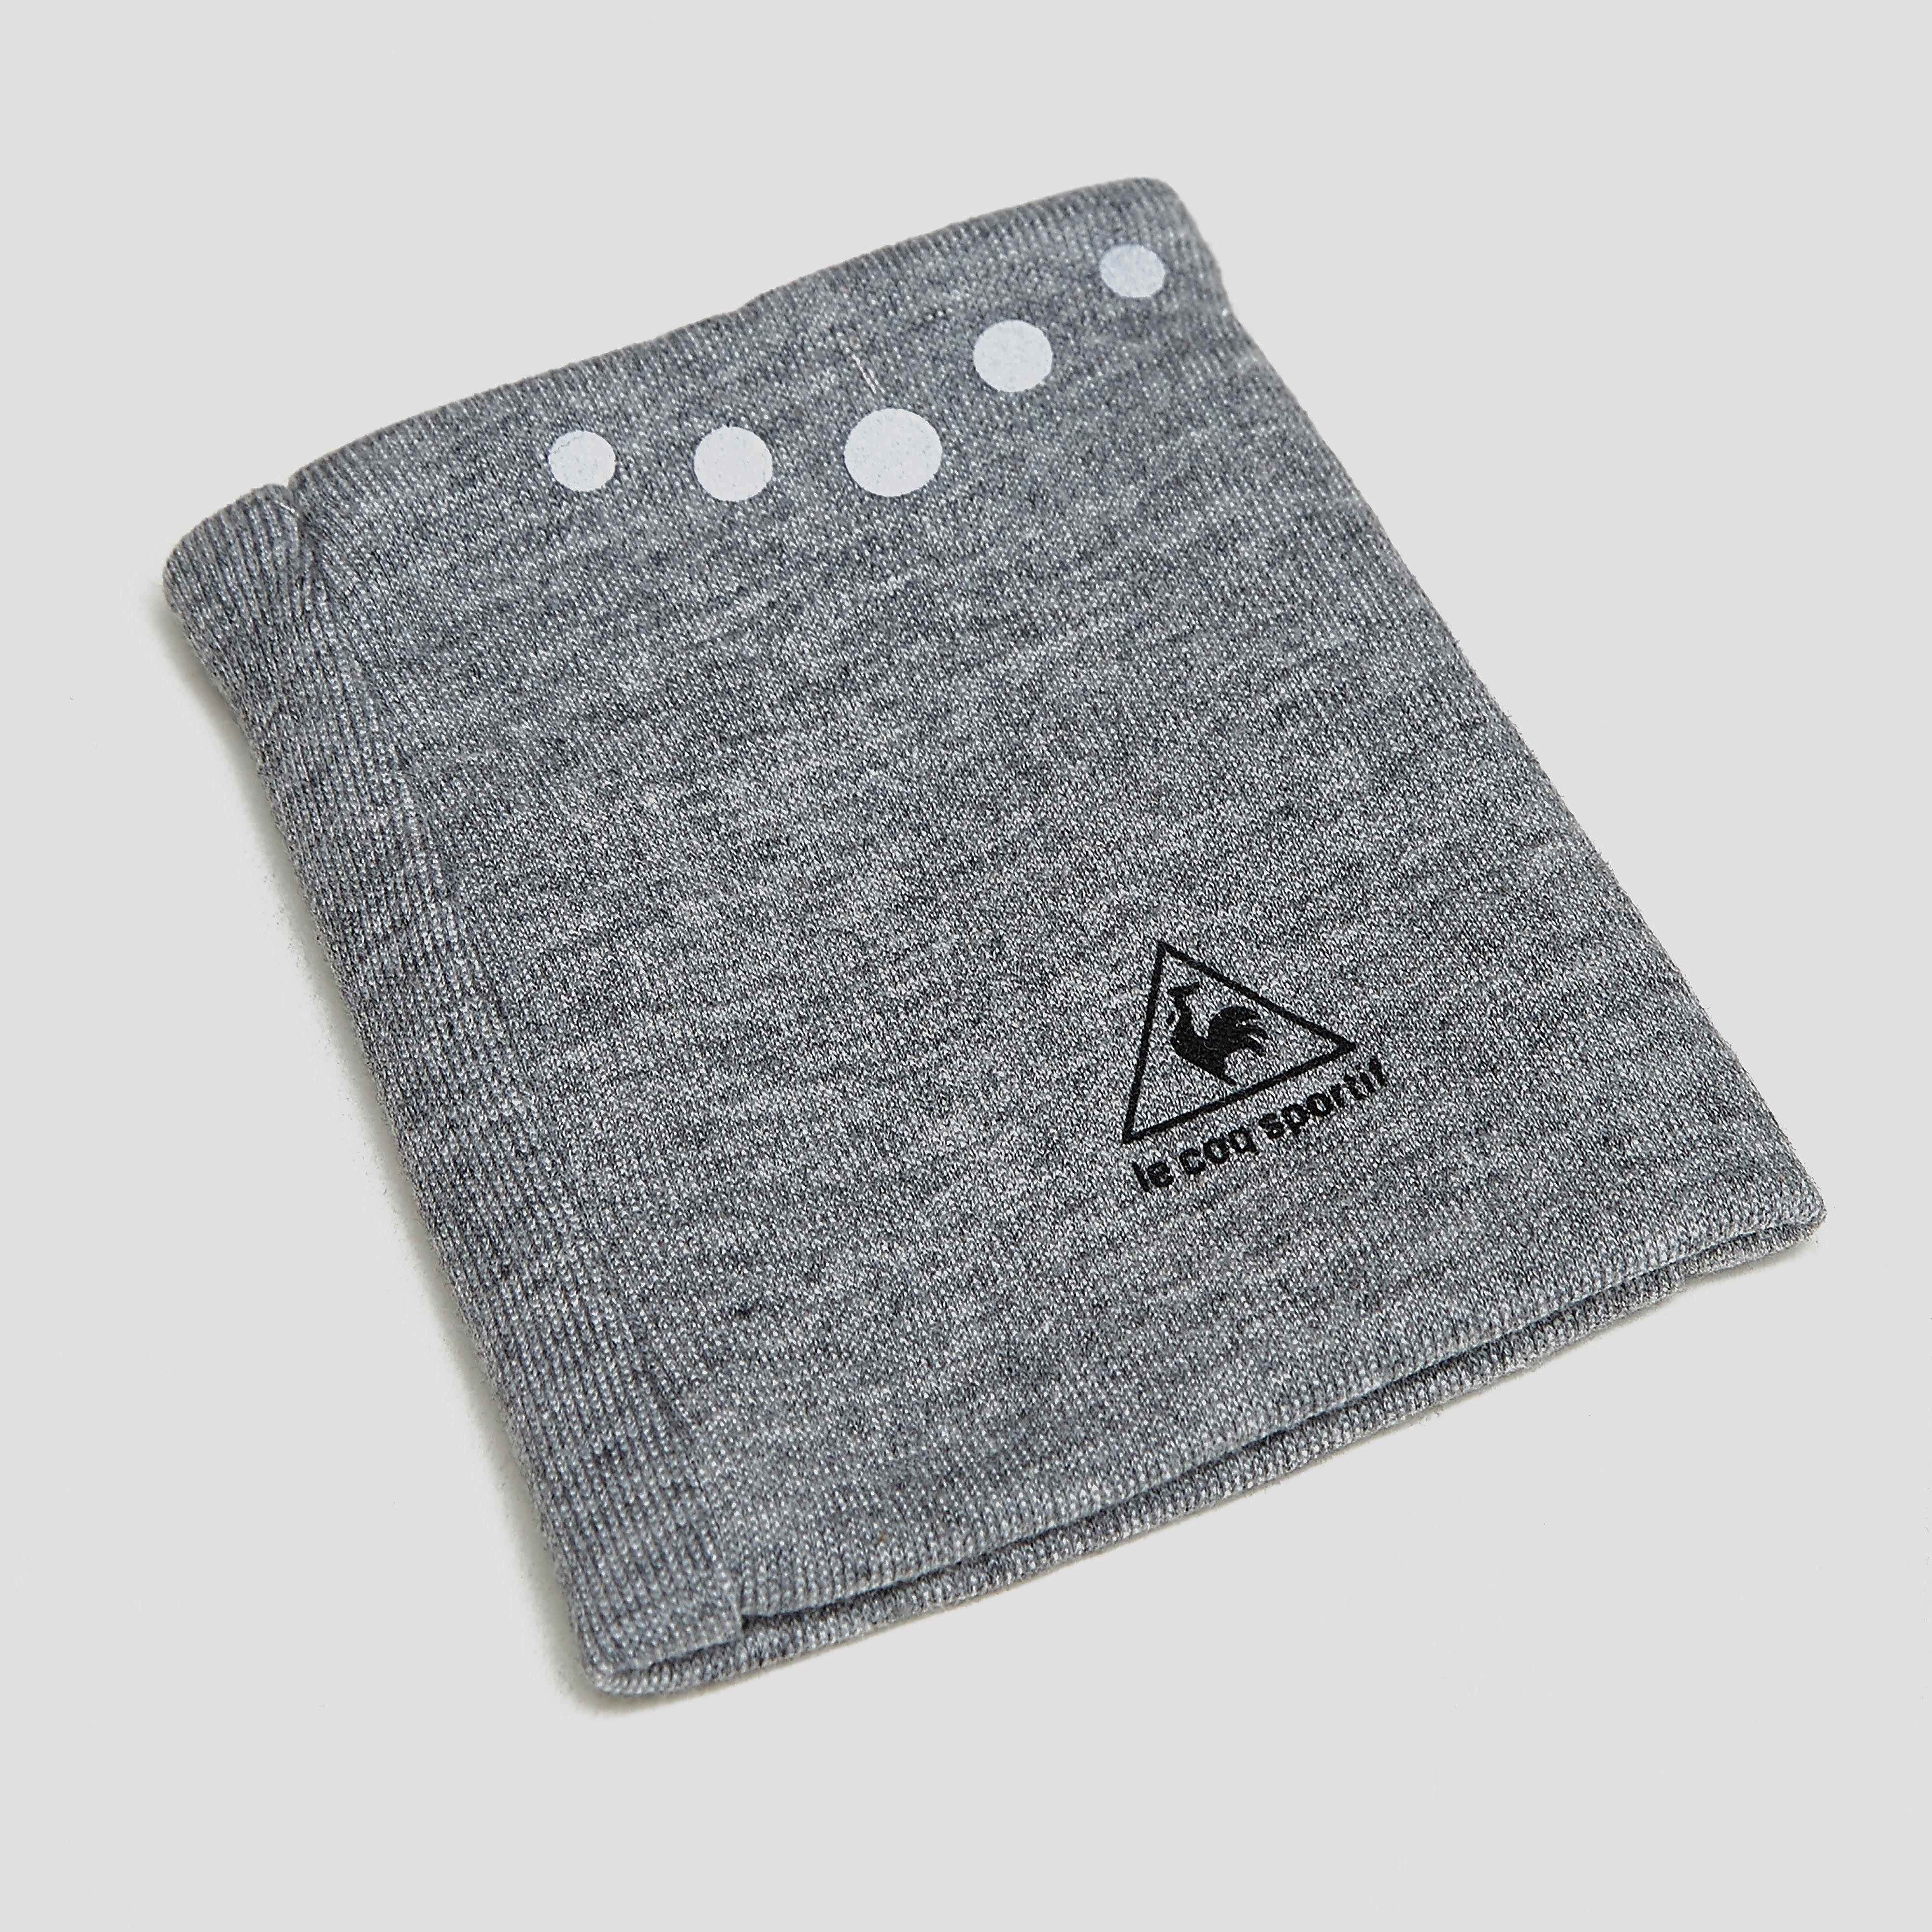 Le Coq Sportif zweetband/haarband grijs